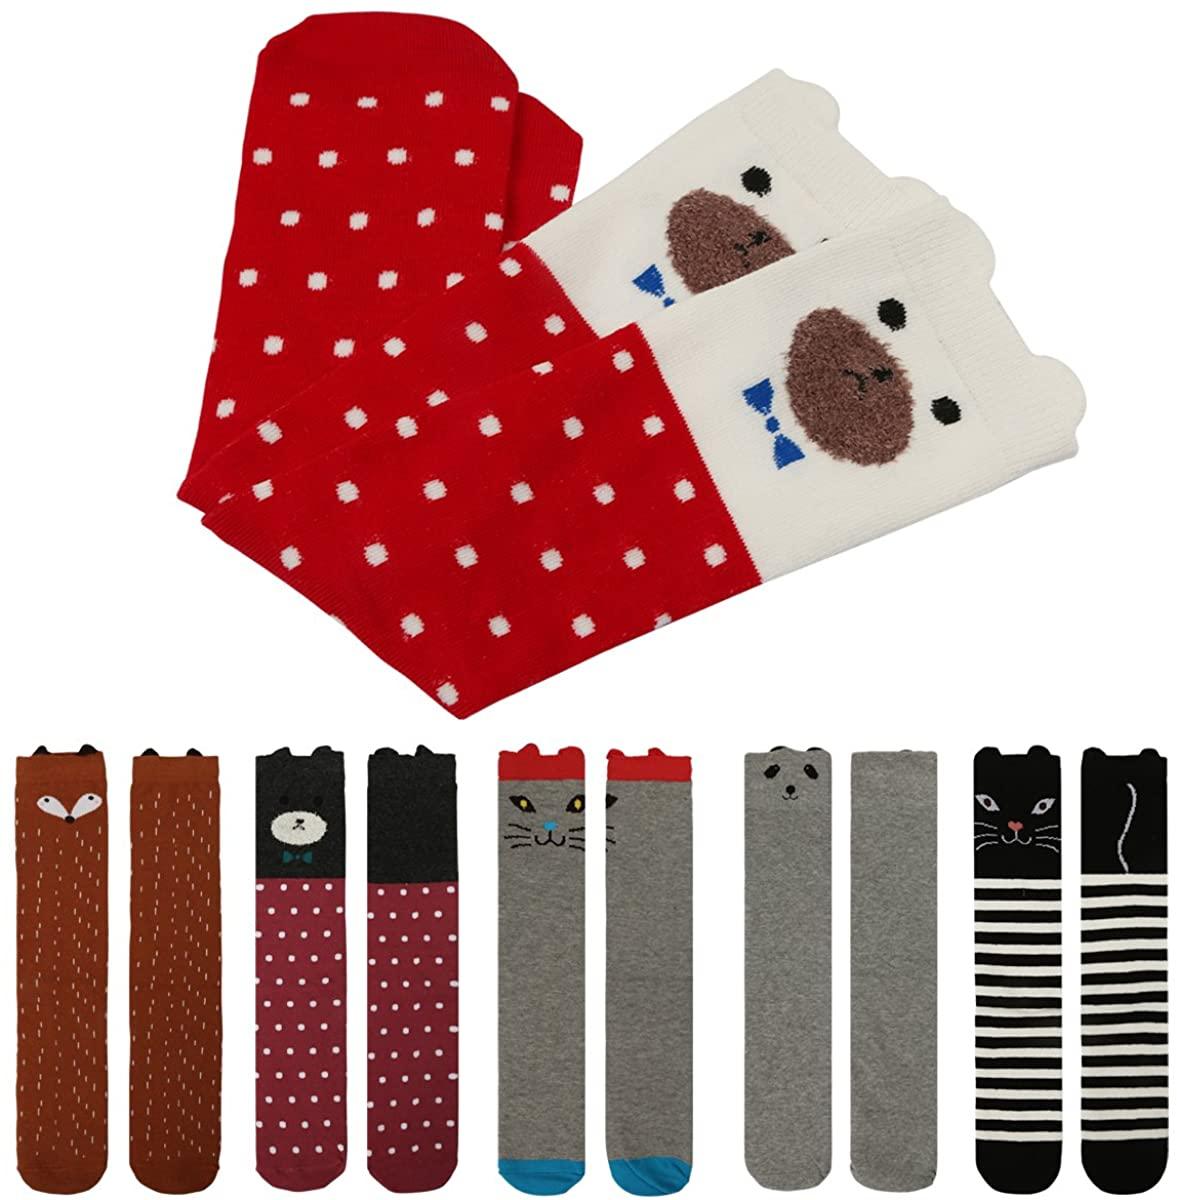 6 Pair Girls Socks Knee High Stockings Cartoon Animal Warm Cotton Long Socks Deekey Updated (Animal 6 Pairs 16